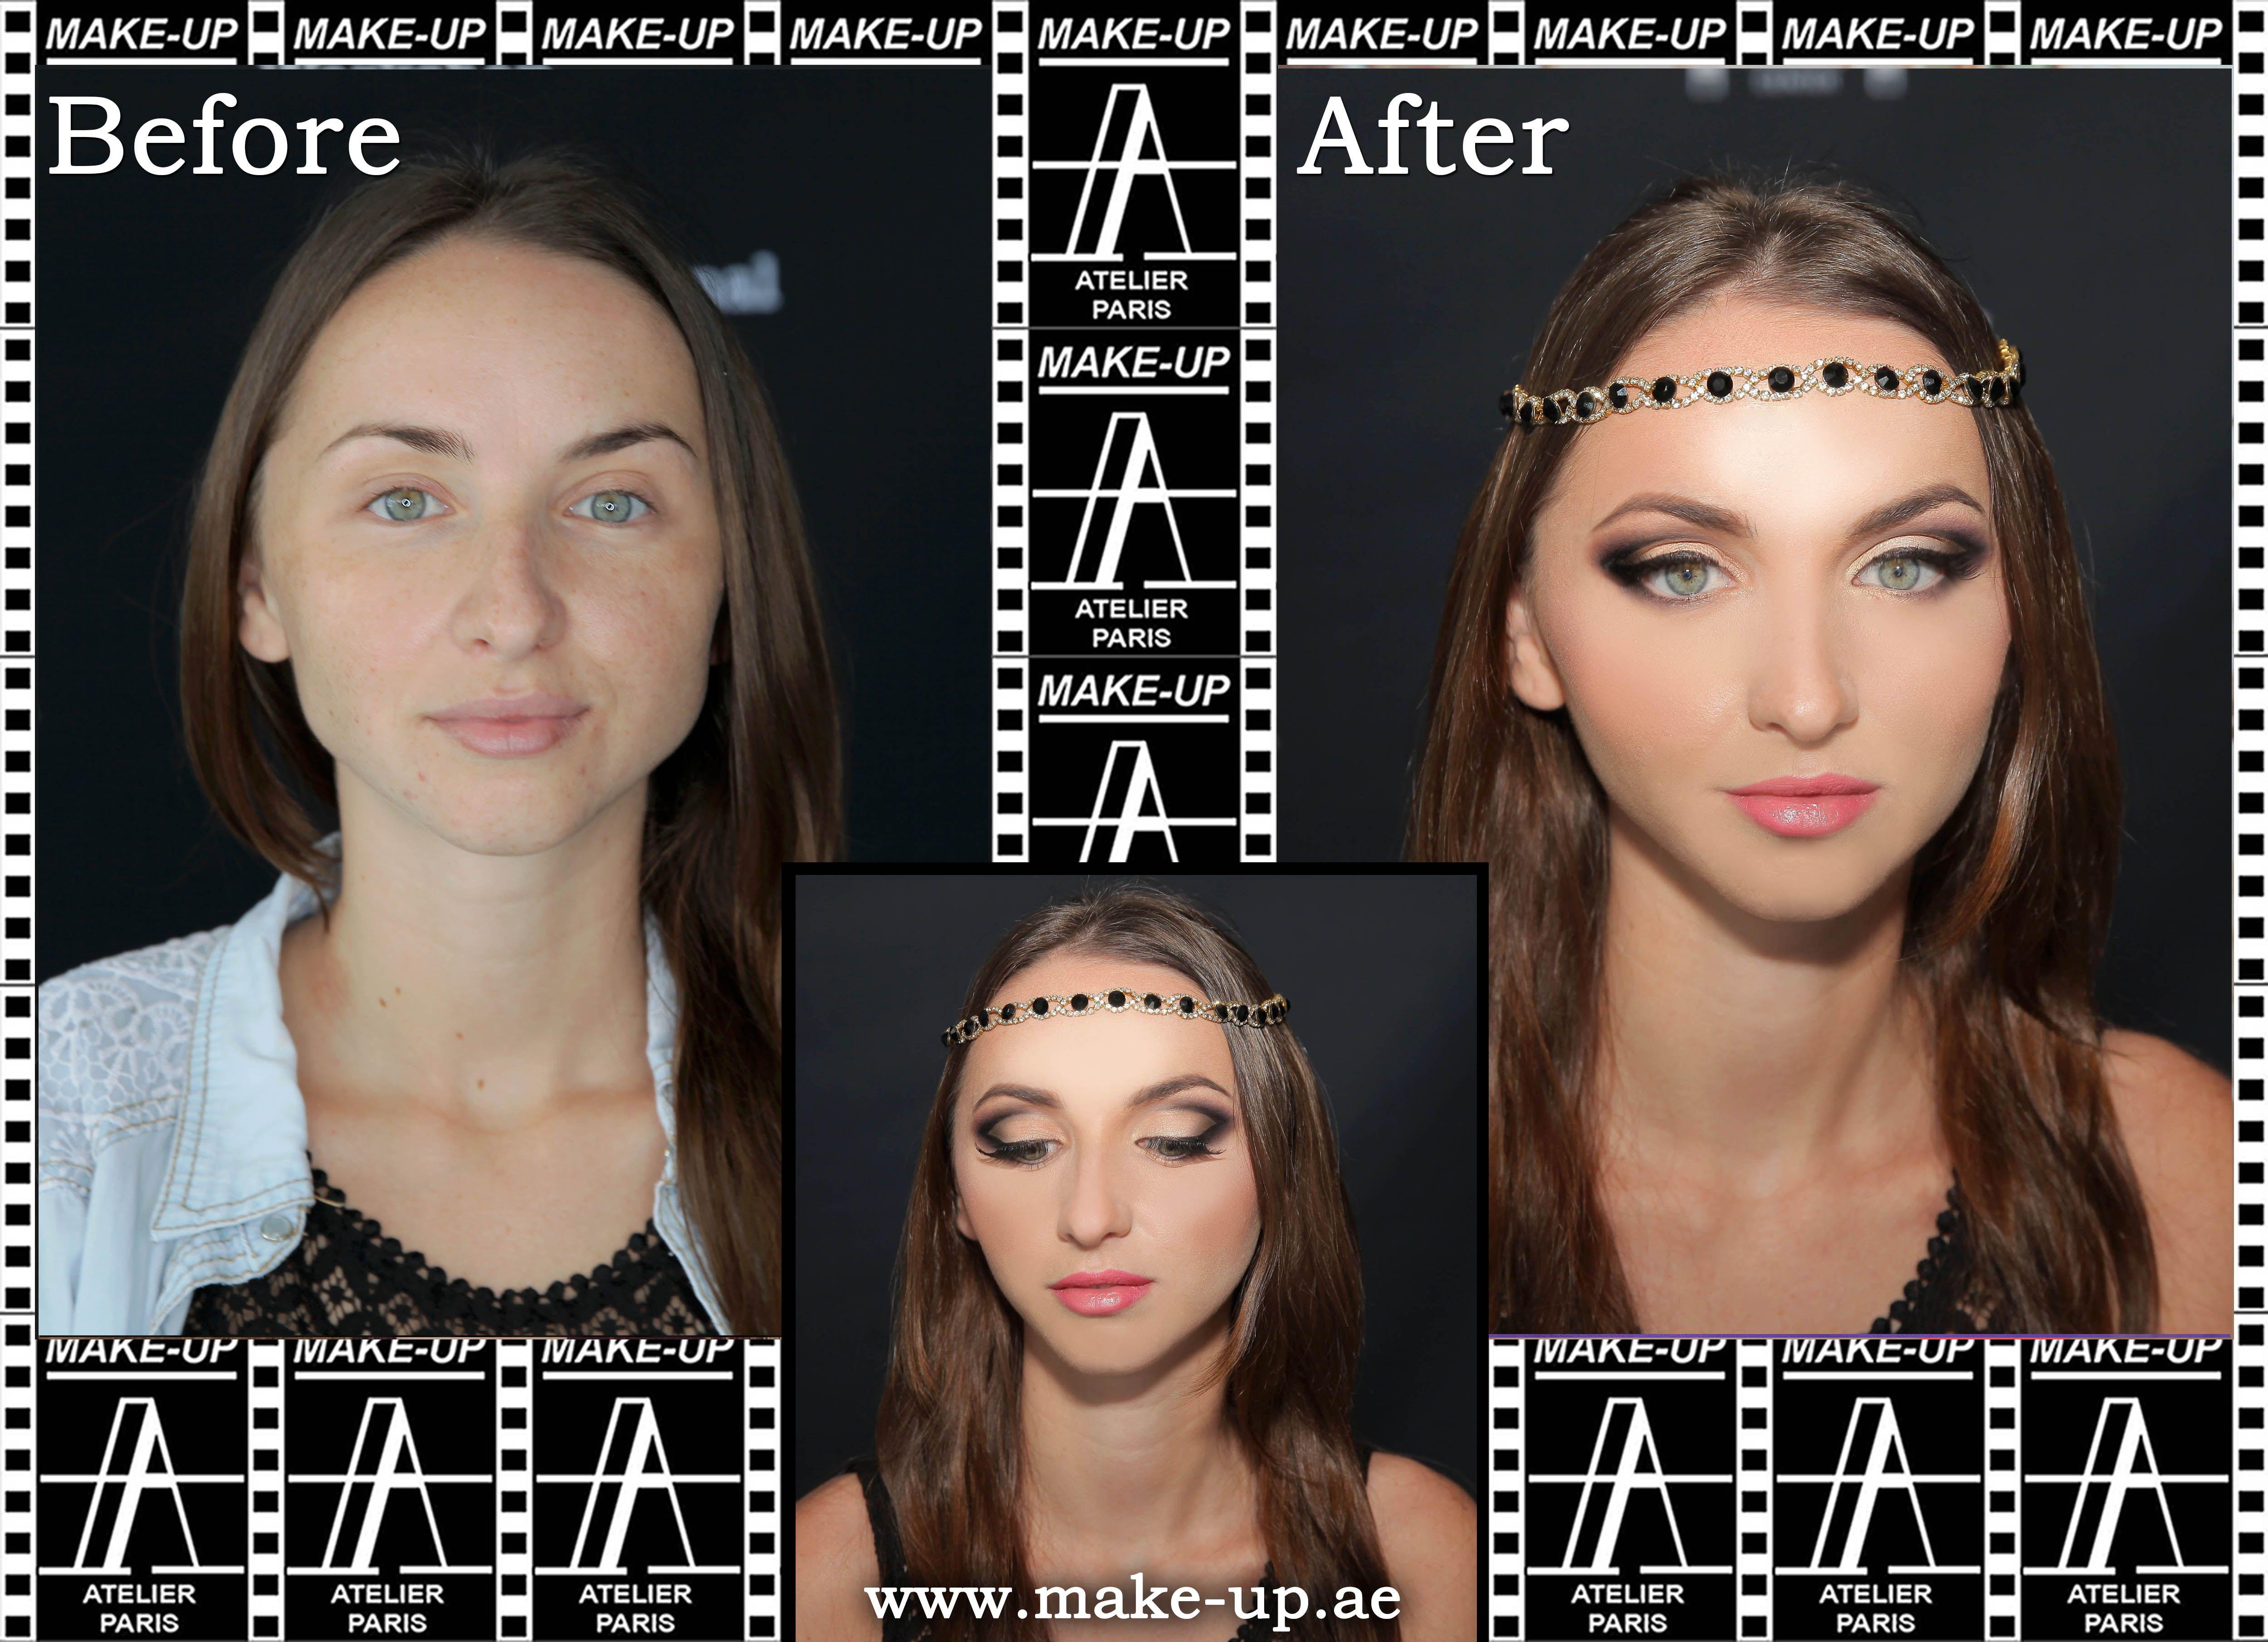 Hello Ladies, MakeUp Atelier Training Center is inviting